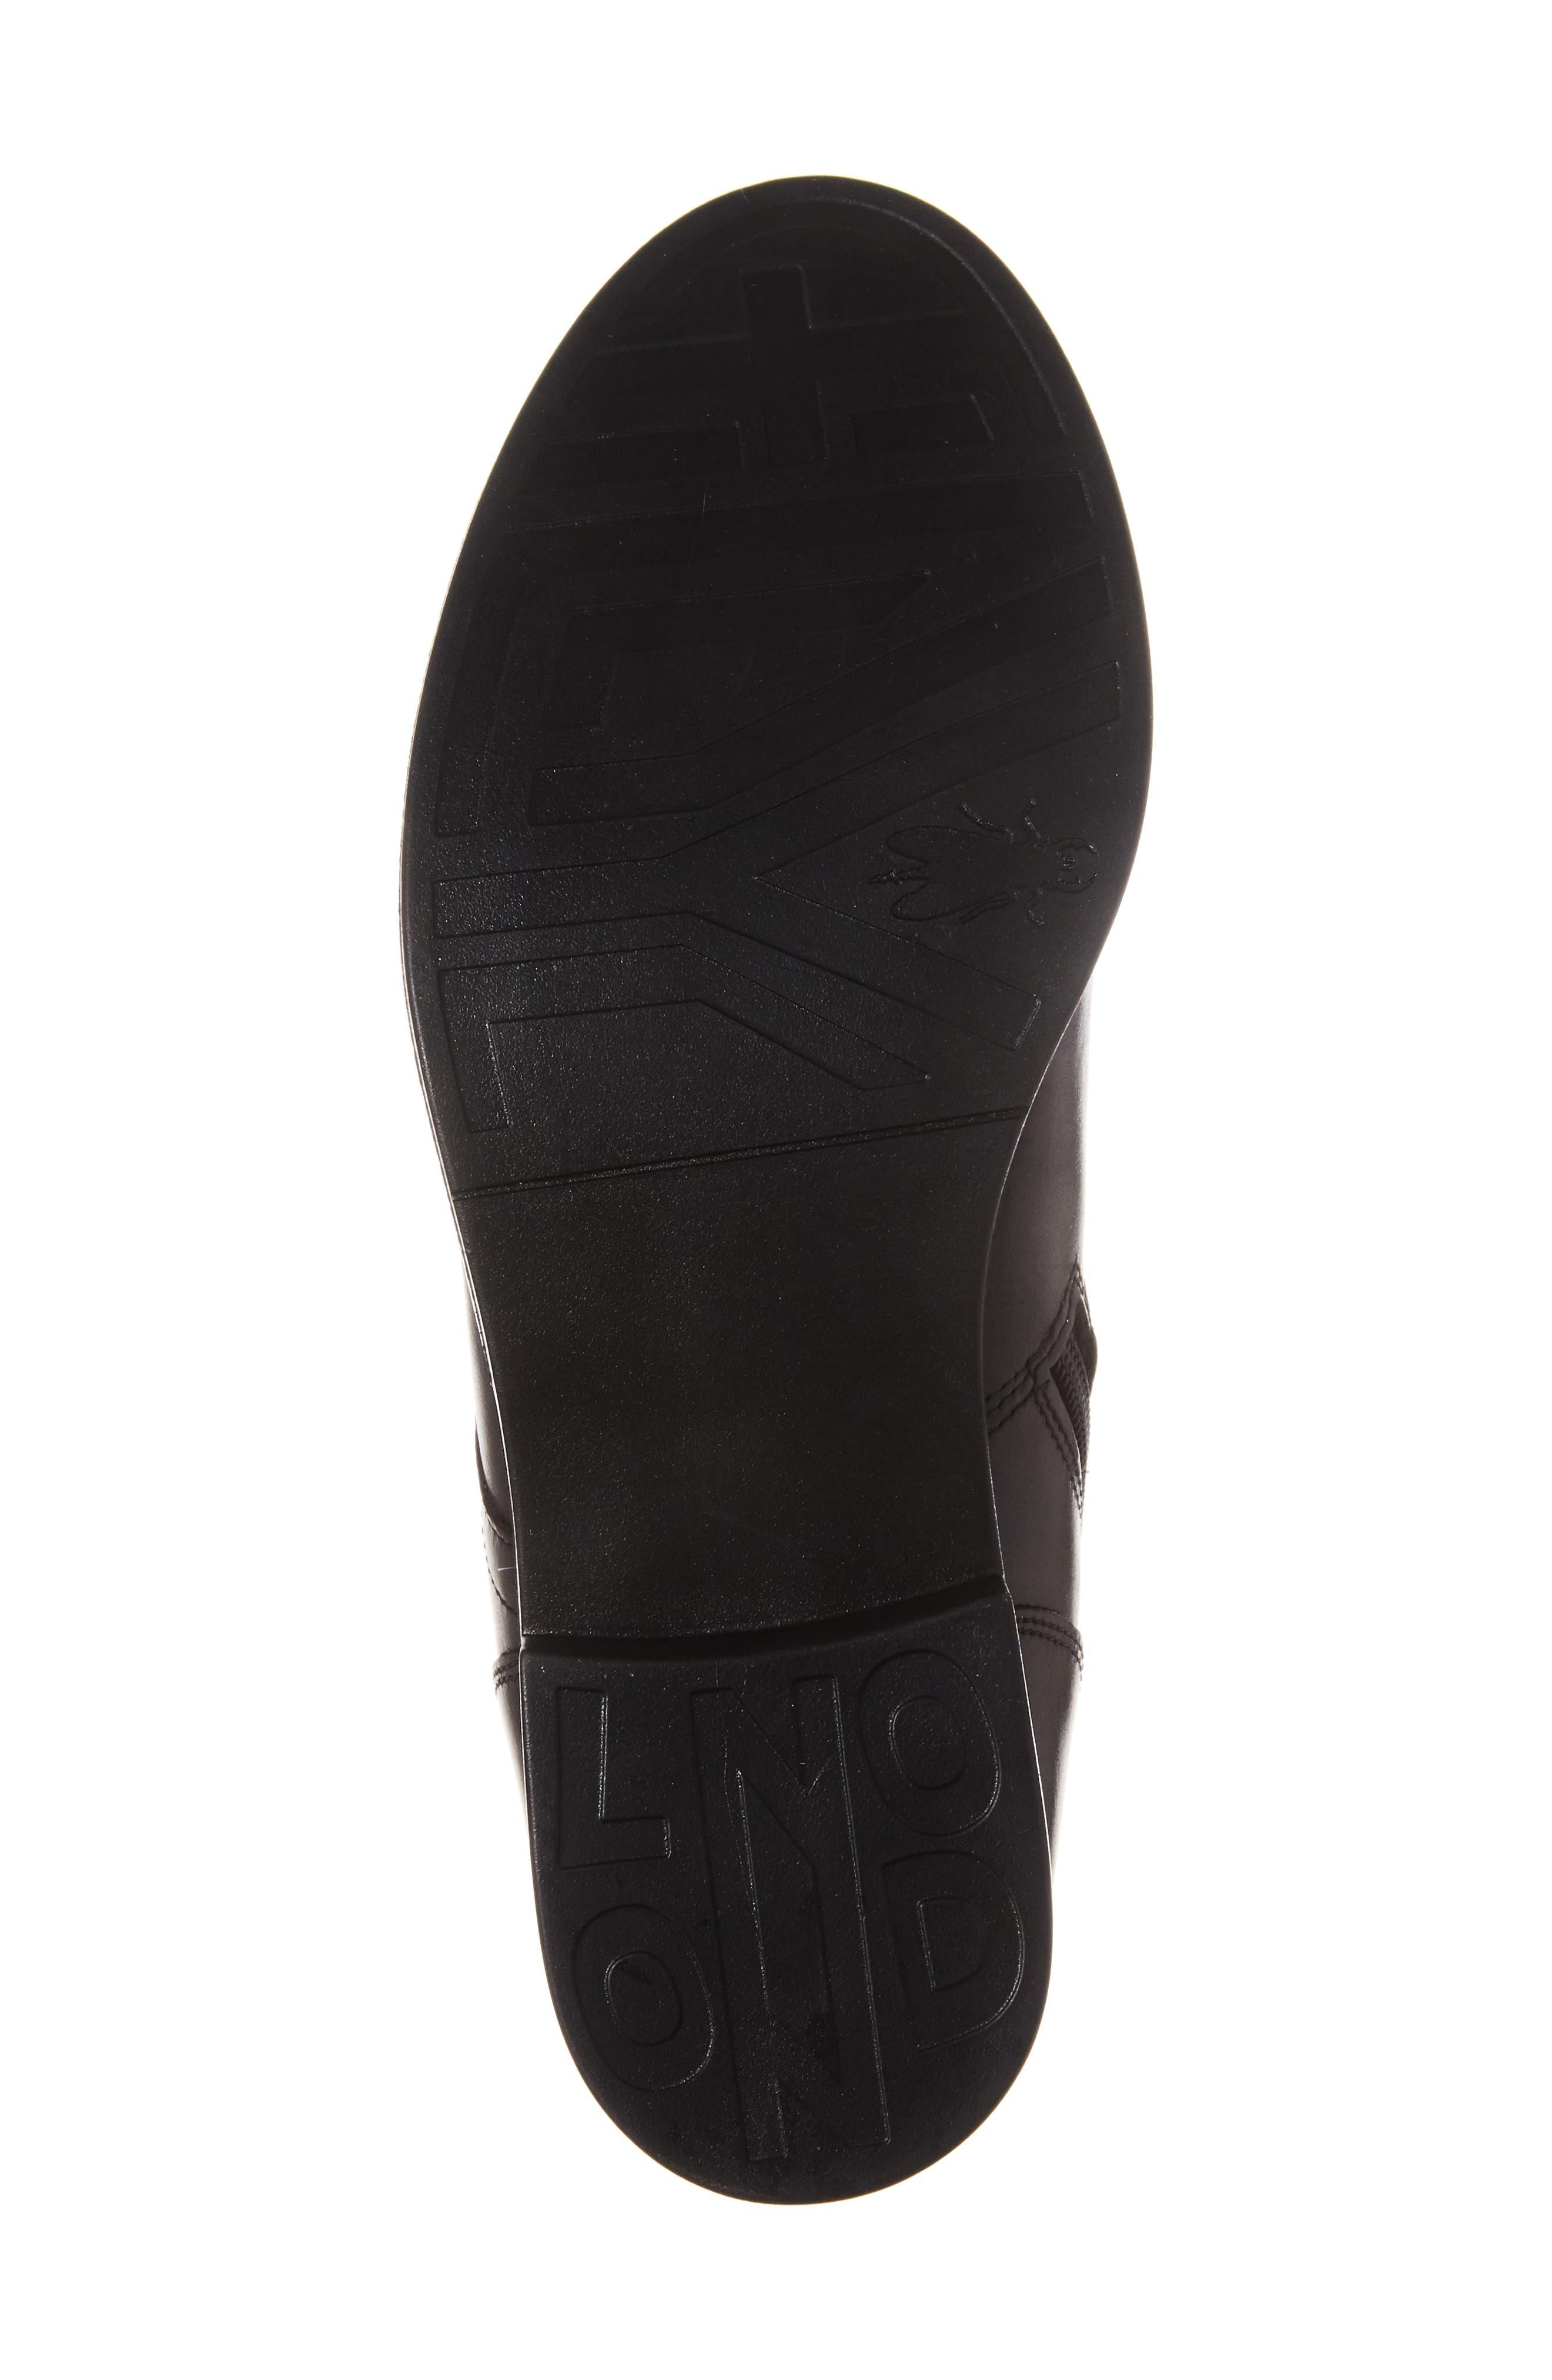 Arty Boot,                             Alternate thumbnail 6, color,                             Black/ Ocean Leather